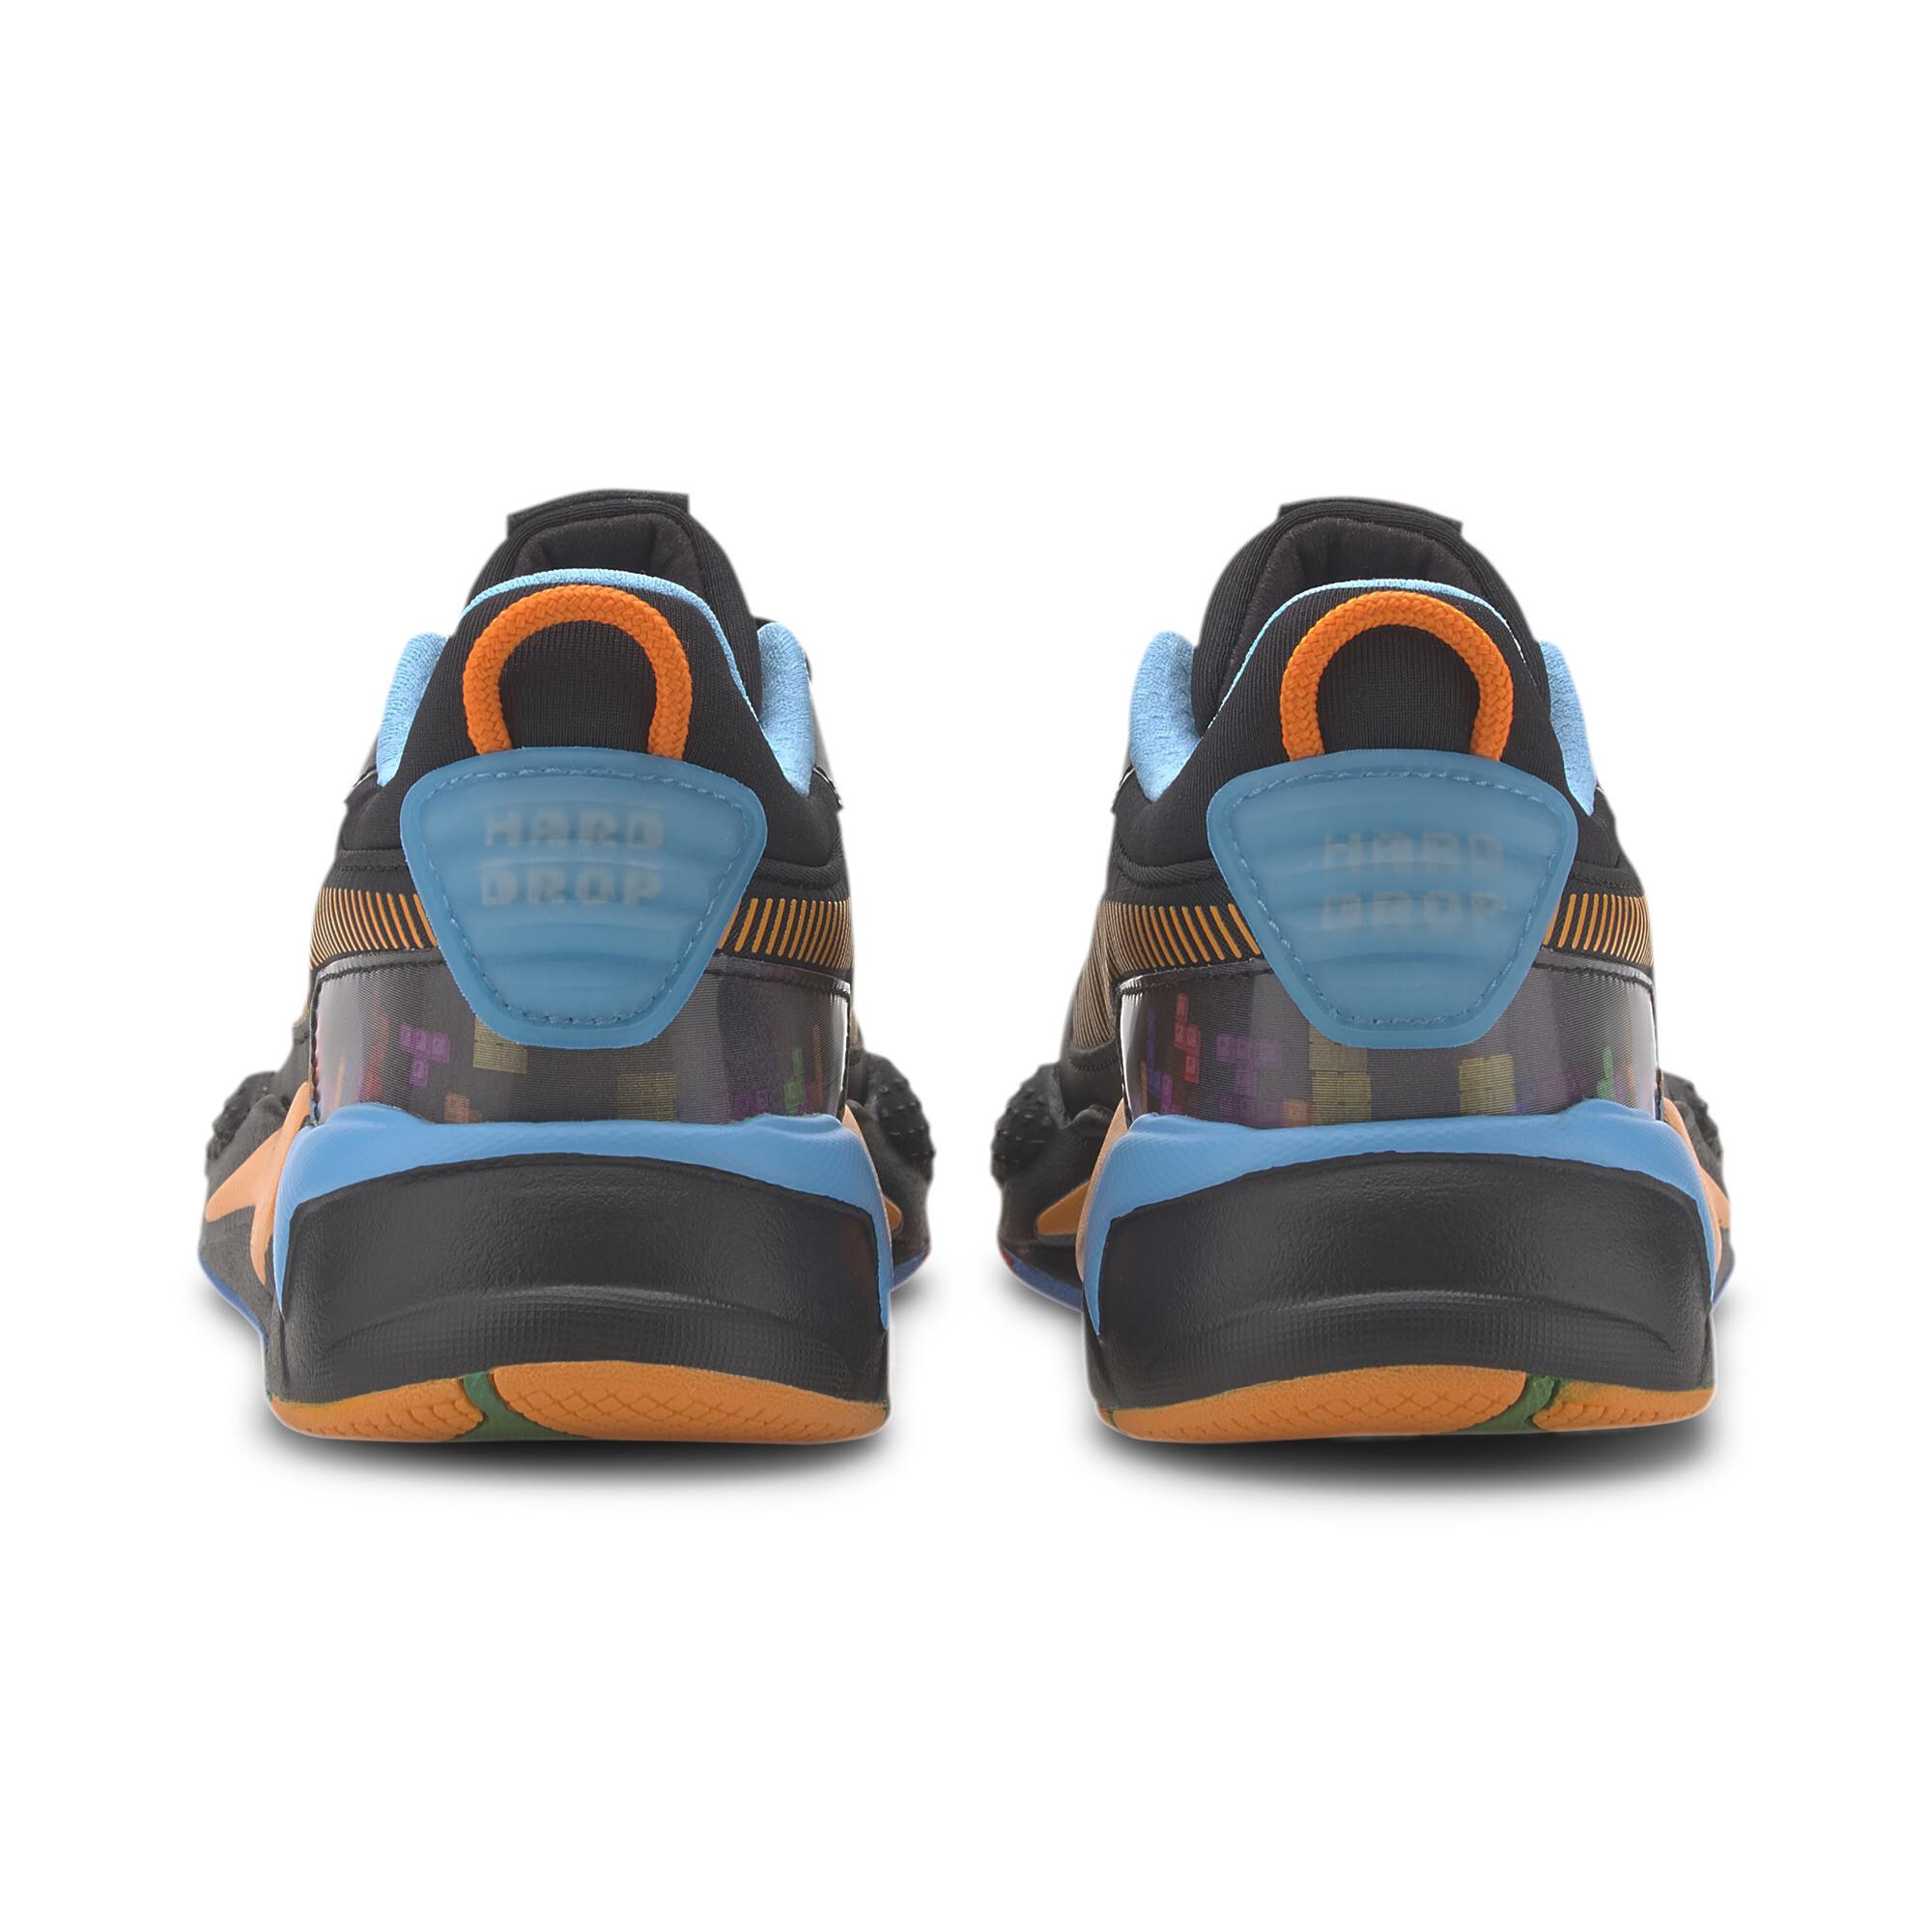 PUMA-PUMA-x-TETRIS-RS-X-Little-Kids-039-Shoes-Kids-Shoe-Kids thumbnail 3